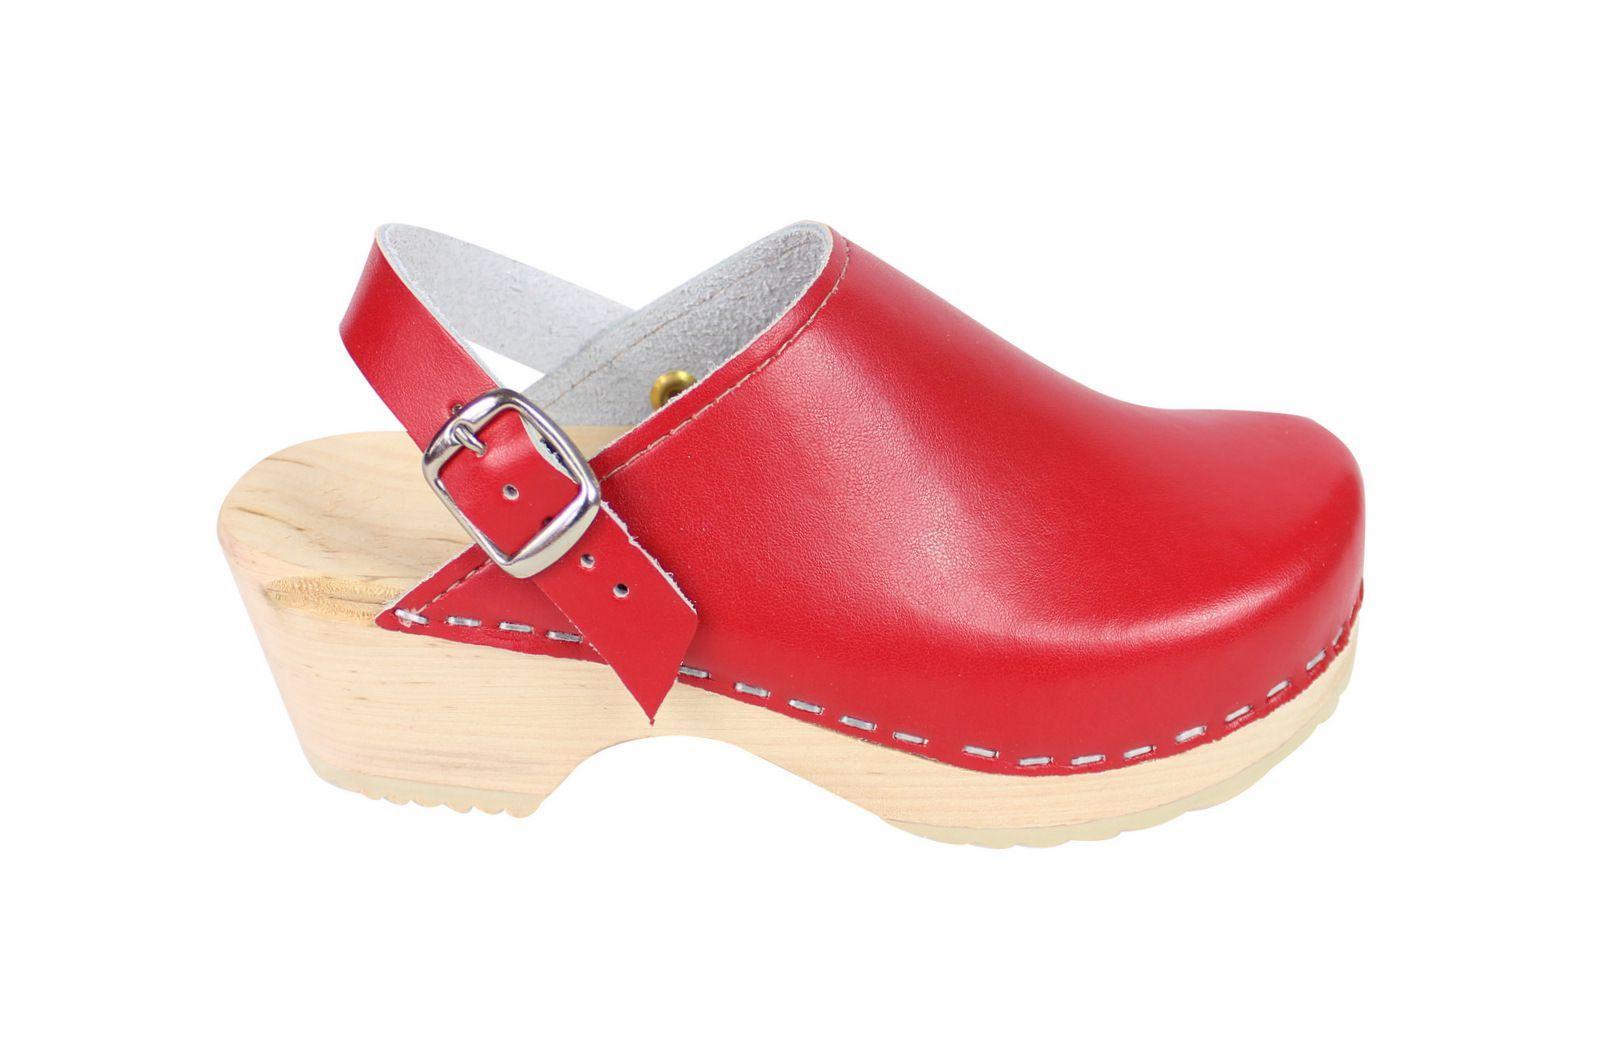 Little Lotta's Kids Classic Clogs in Red Side Strap